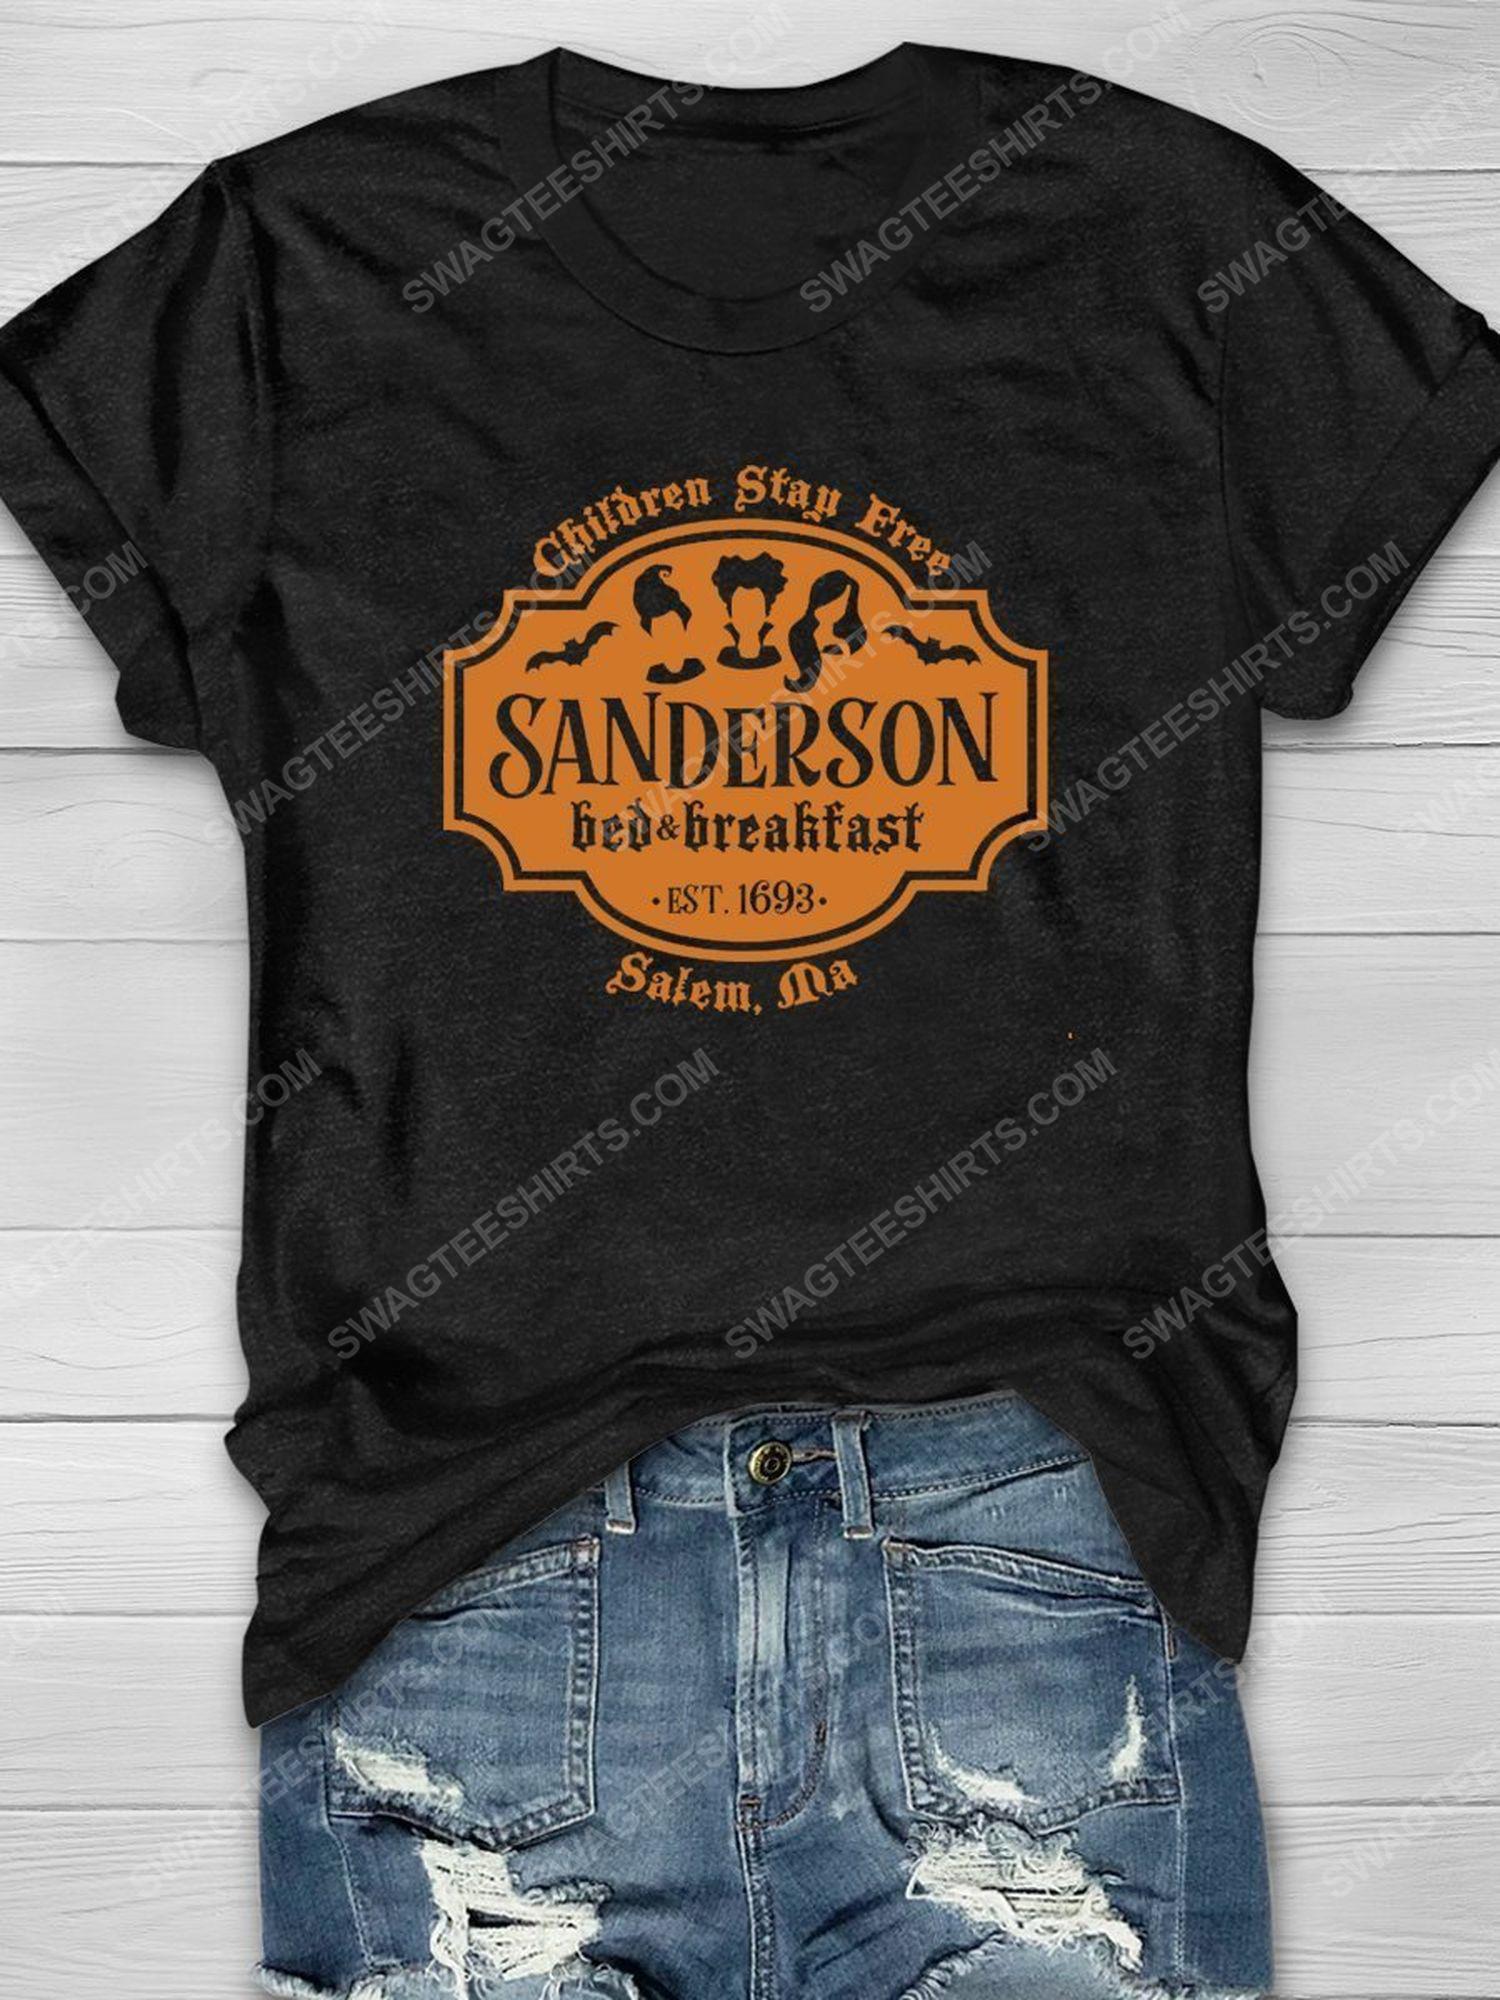 Halloween children stay free sanderson bed breakfast shirt 1 - Copy